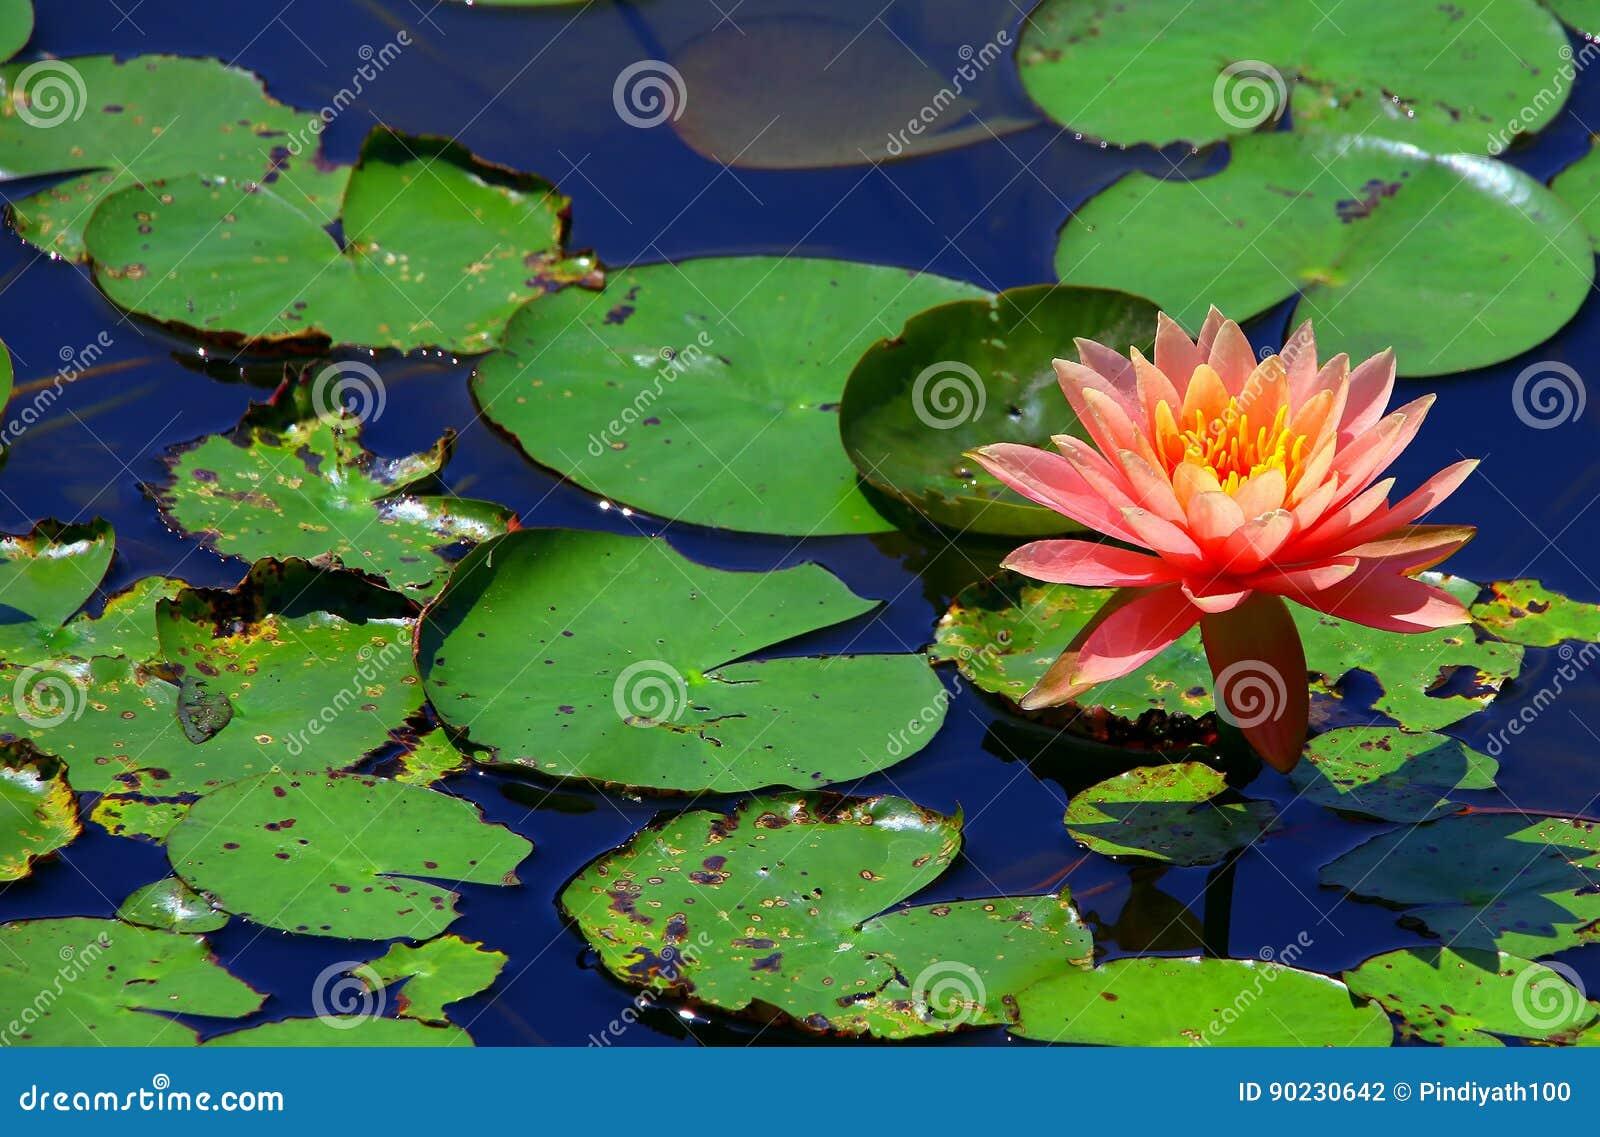 Vibrierende rosa Seerose im Teich